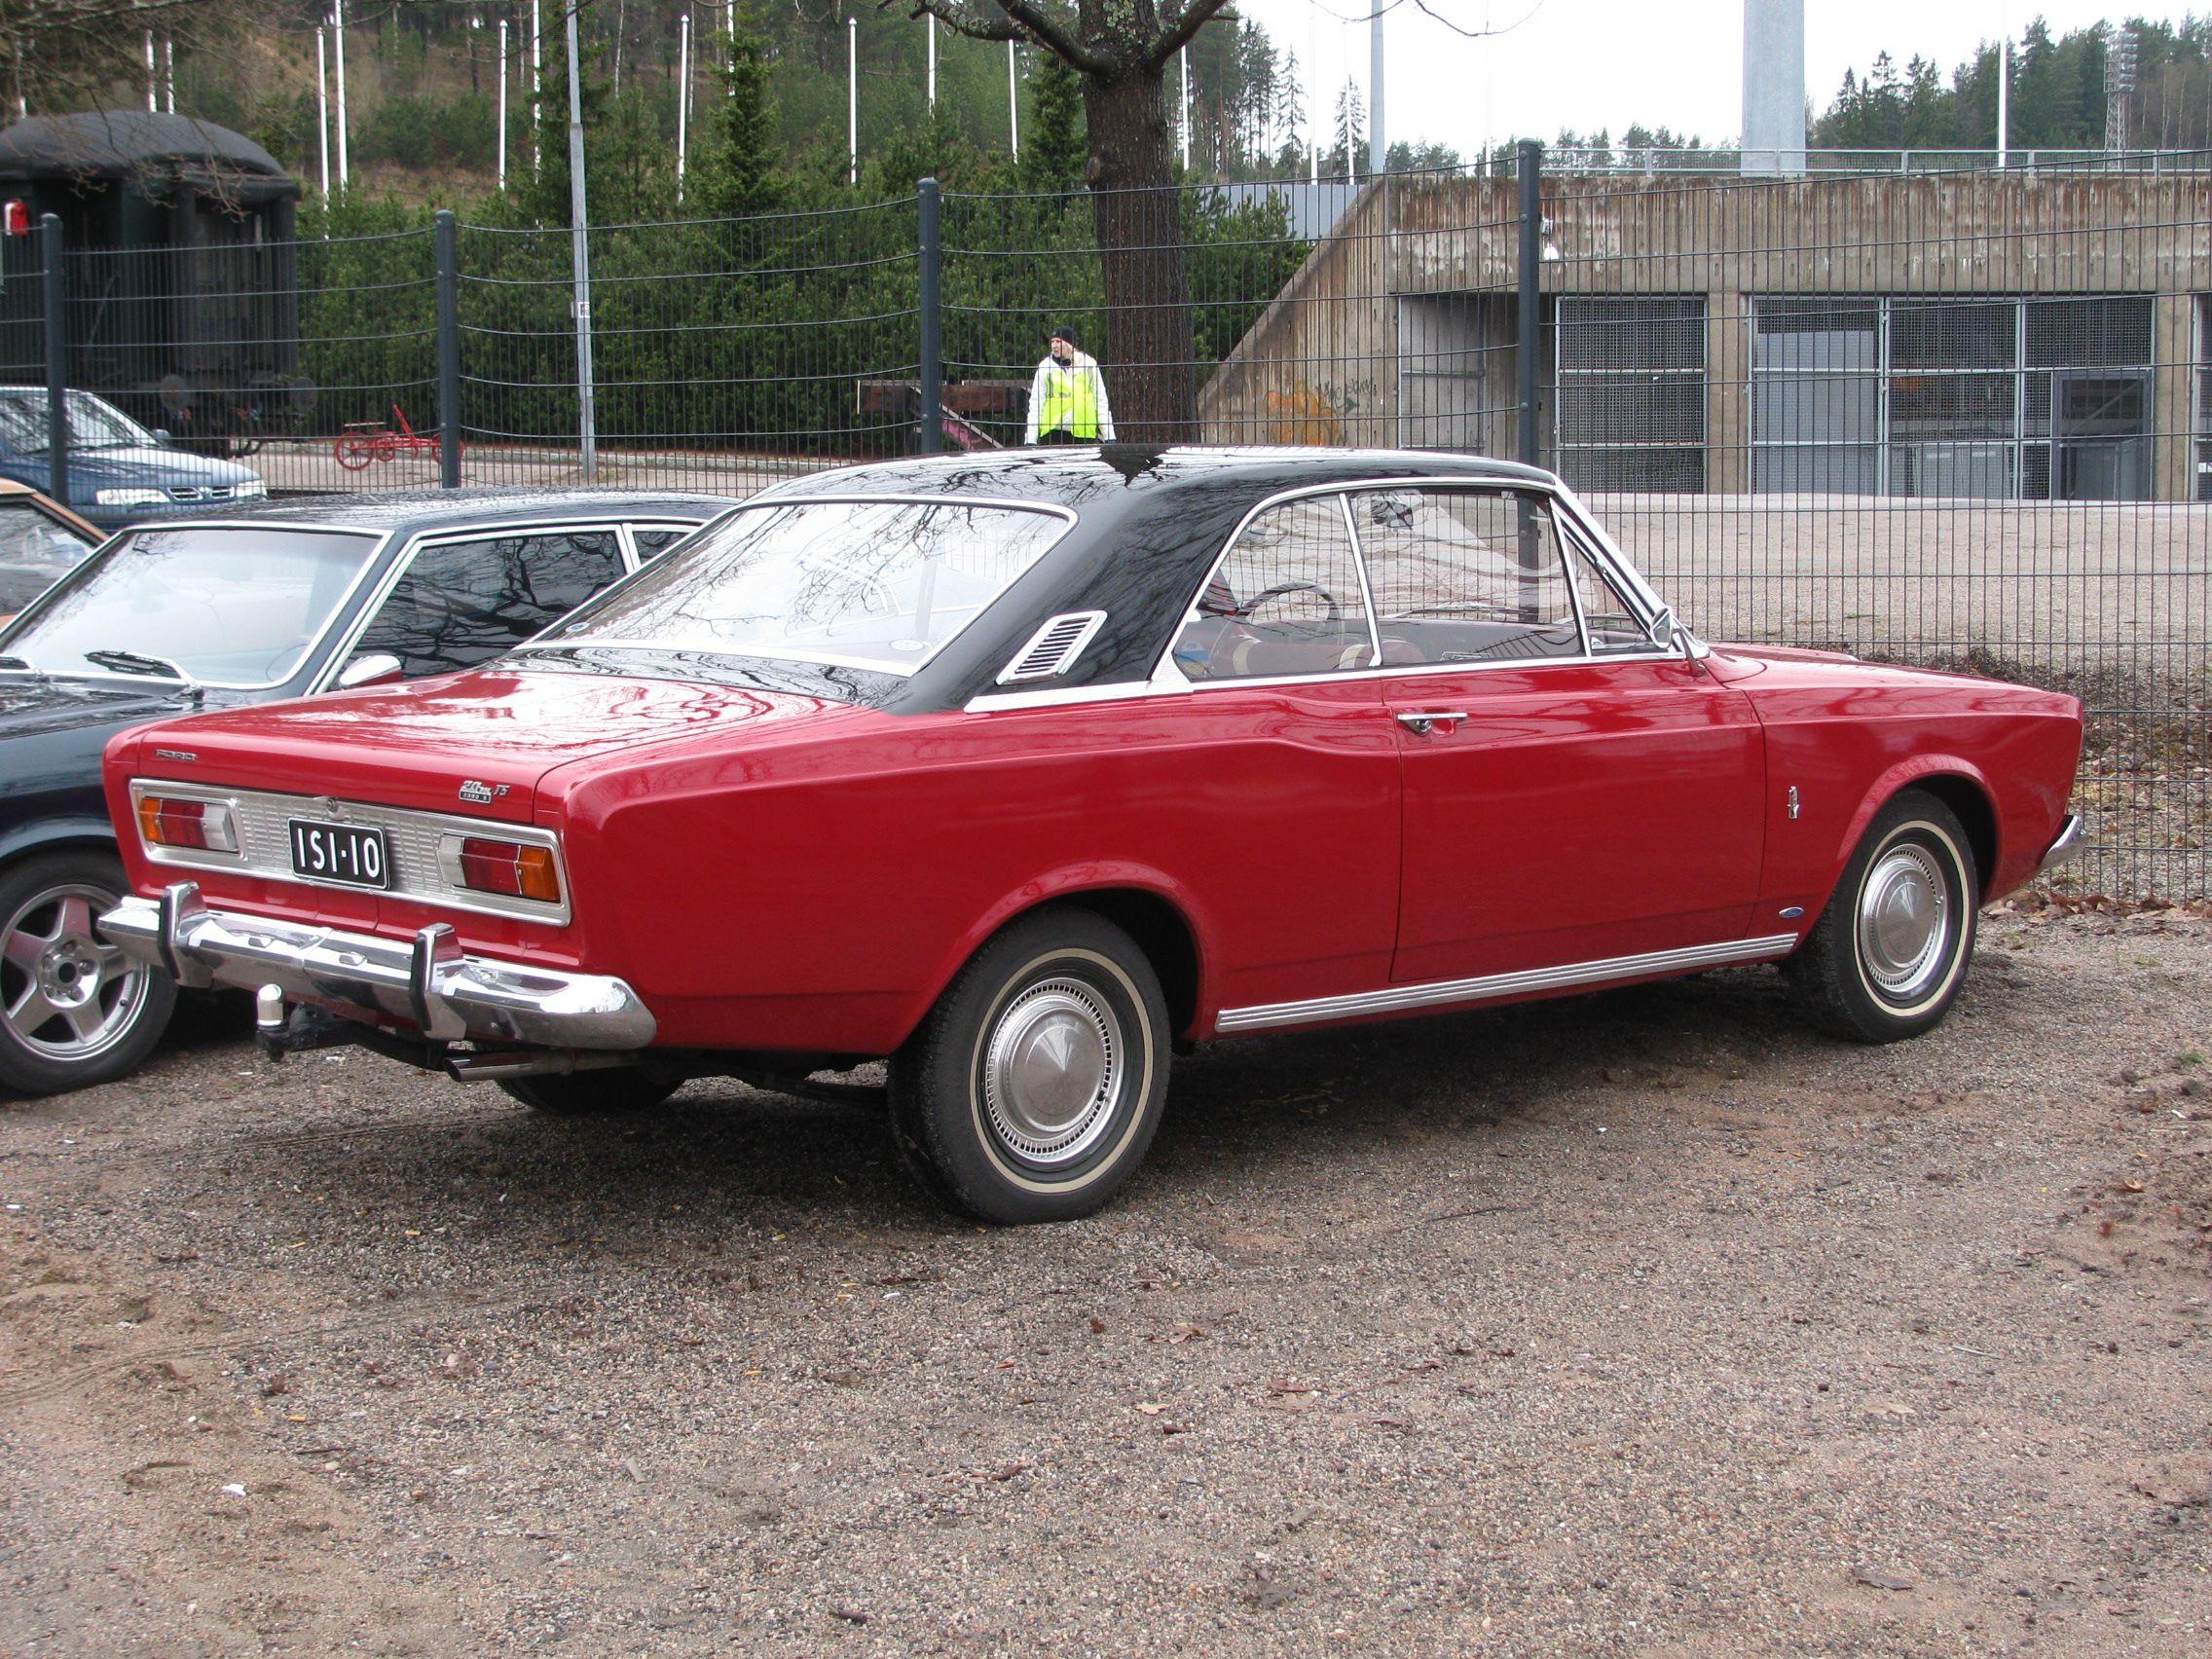 1967 Ford Taunus 20 Mts P7 Rear Side Oldtimer Autos Oldtimer Ford